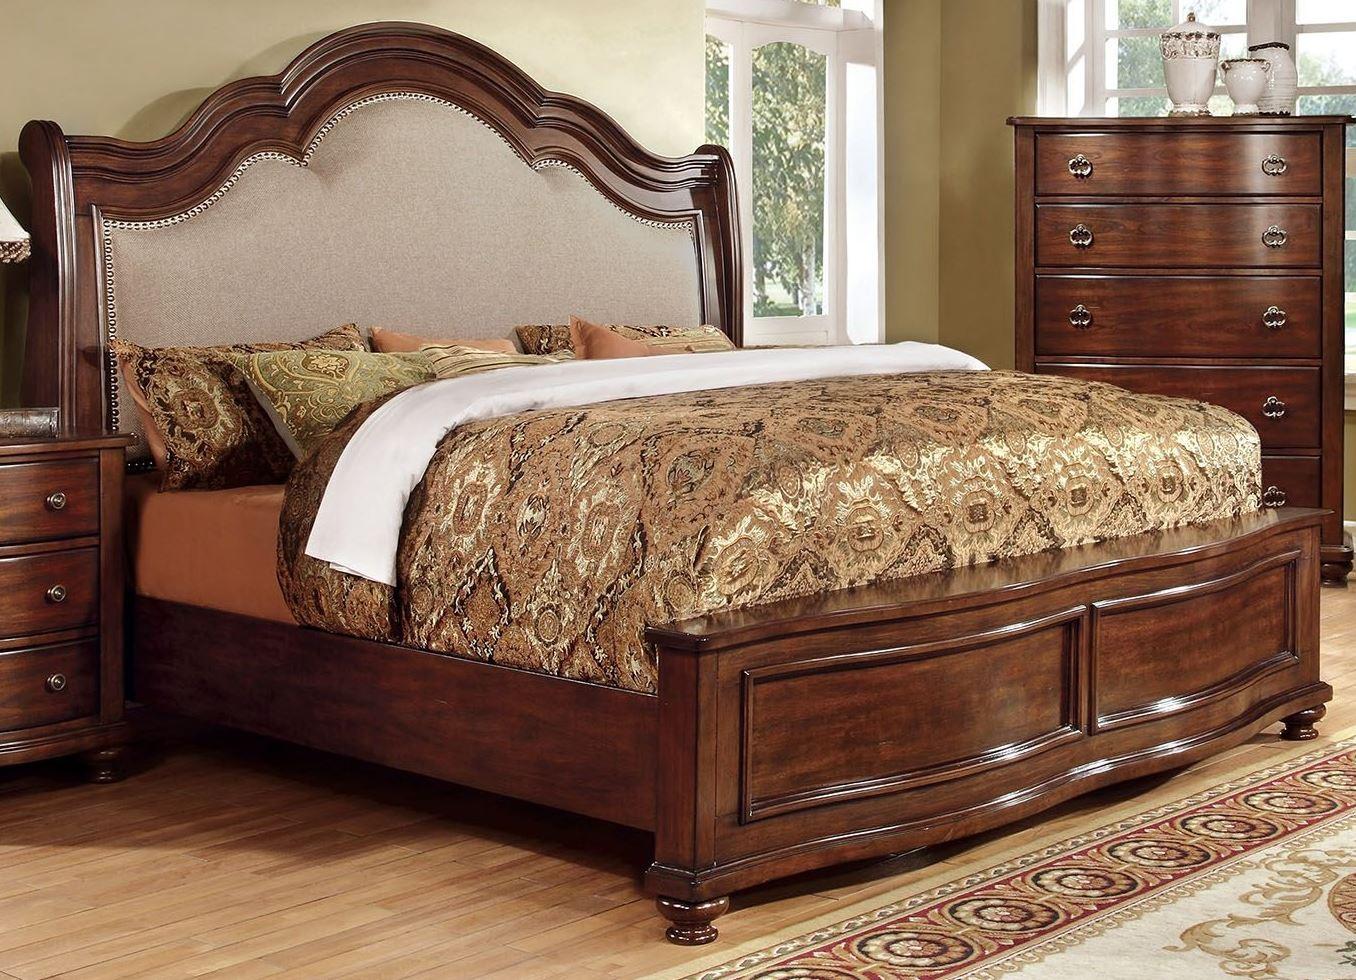 Bellavista Brown Cherry Bedroom Set From Furniture Of America Cm7350q Bed Coleman Furniture